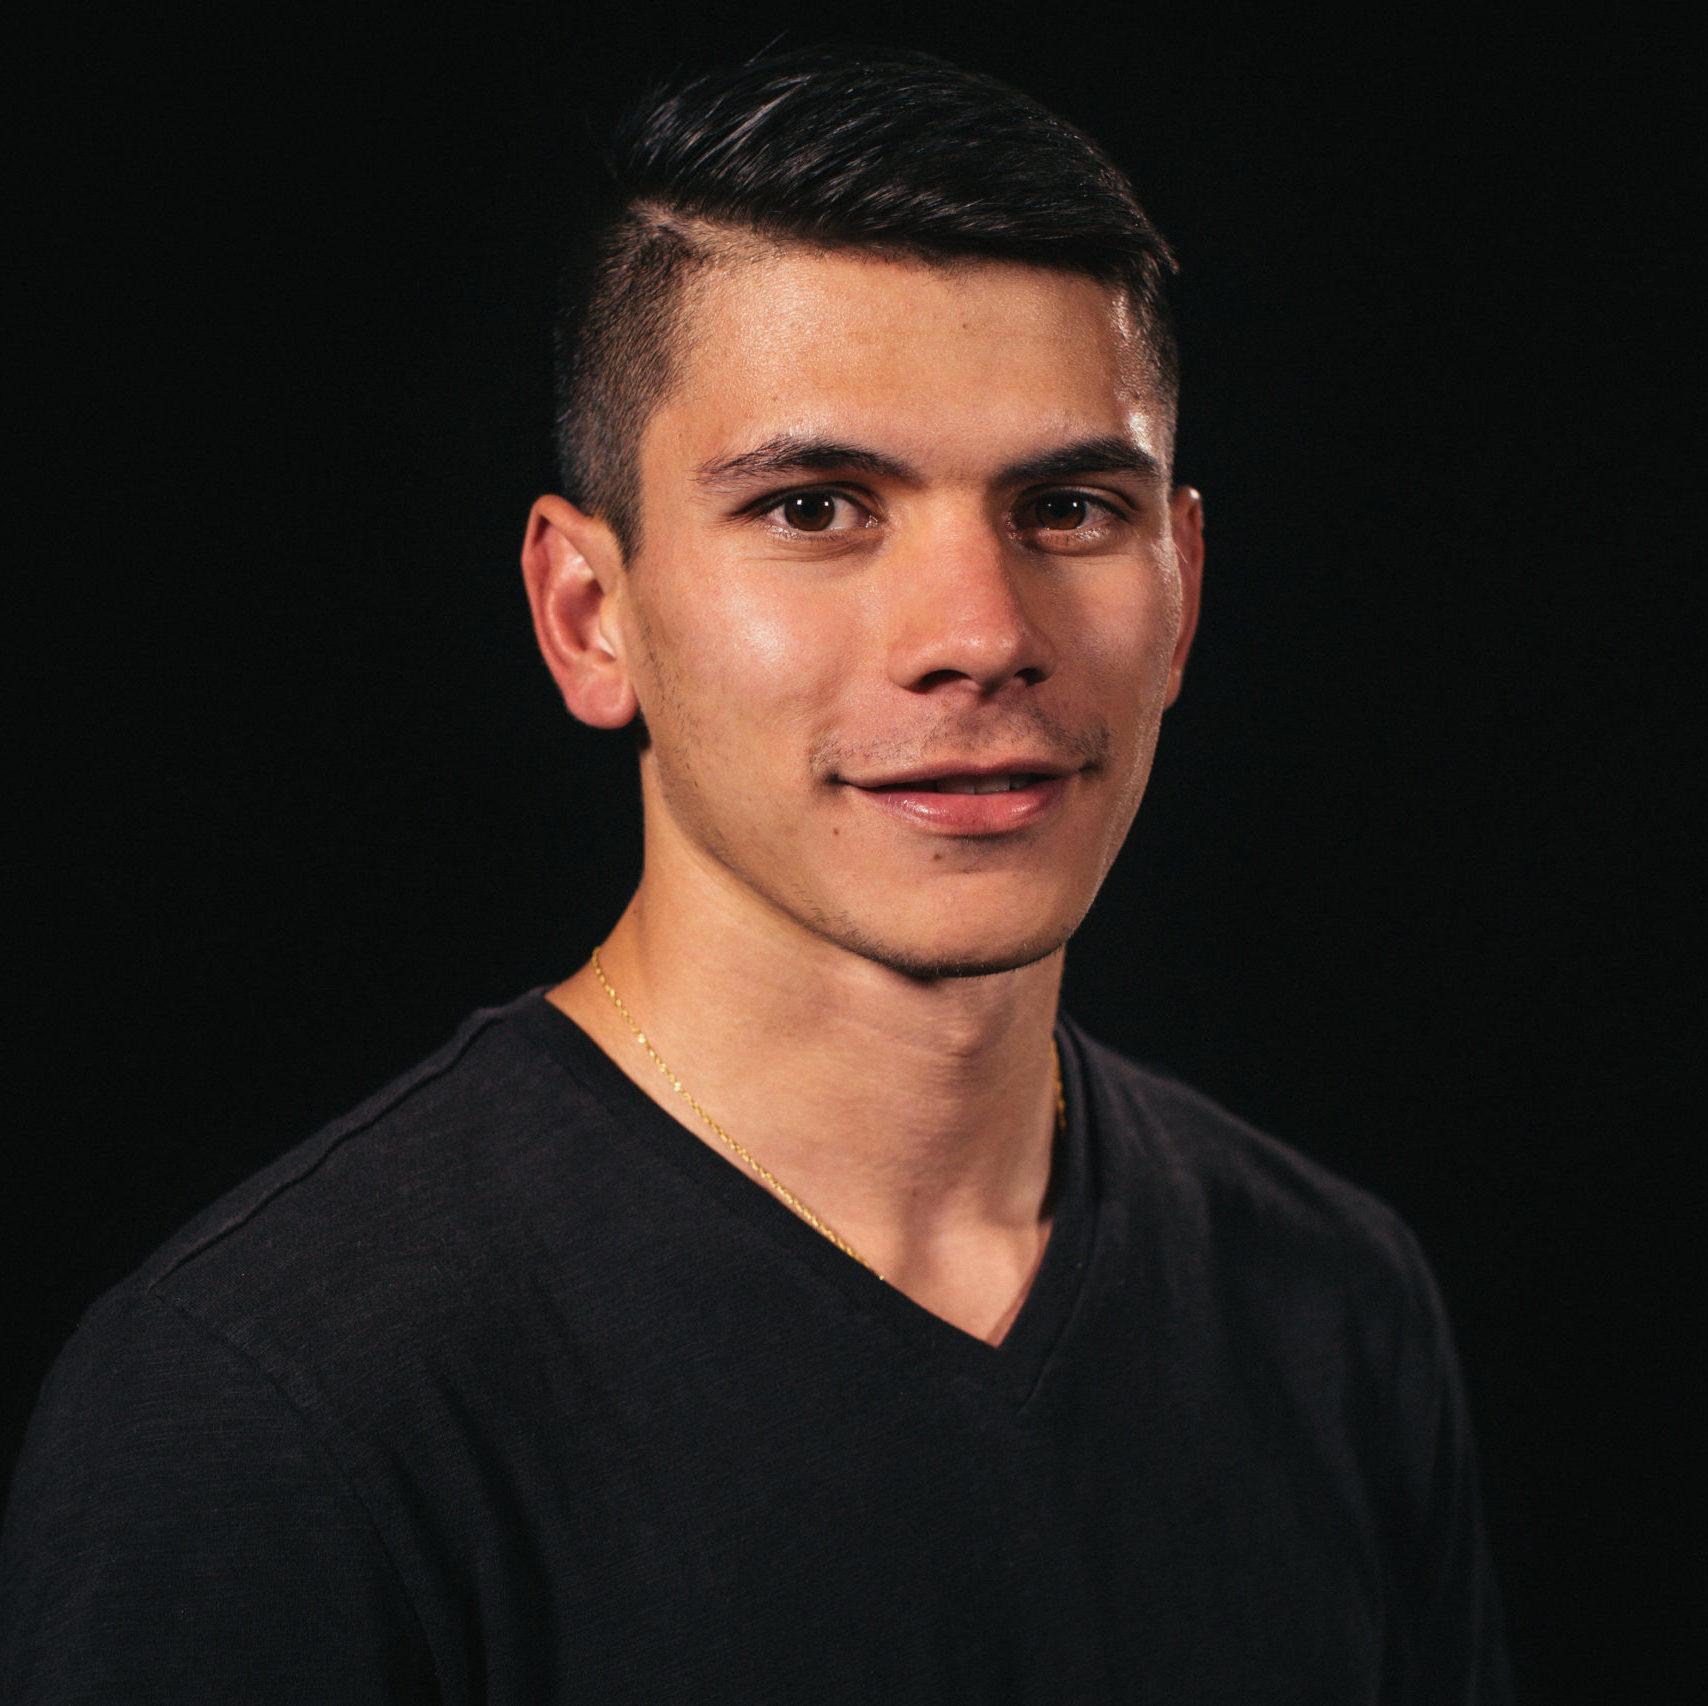 Micah Gonsalves